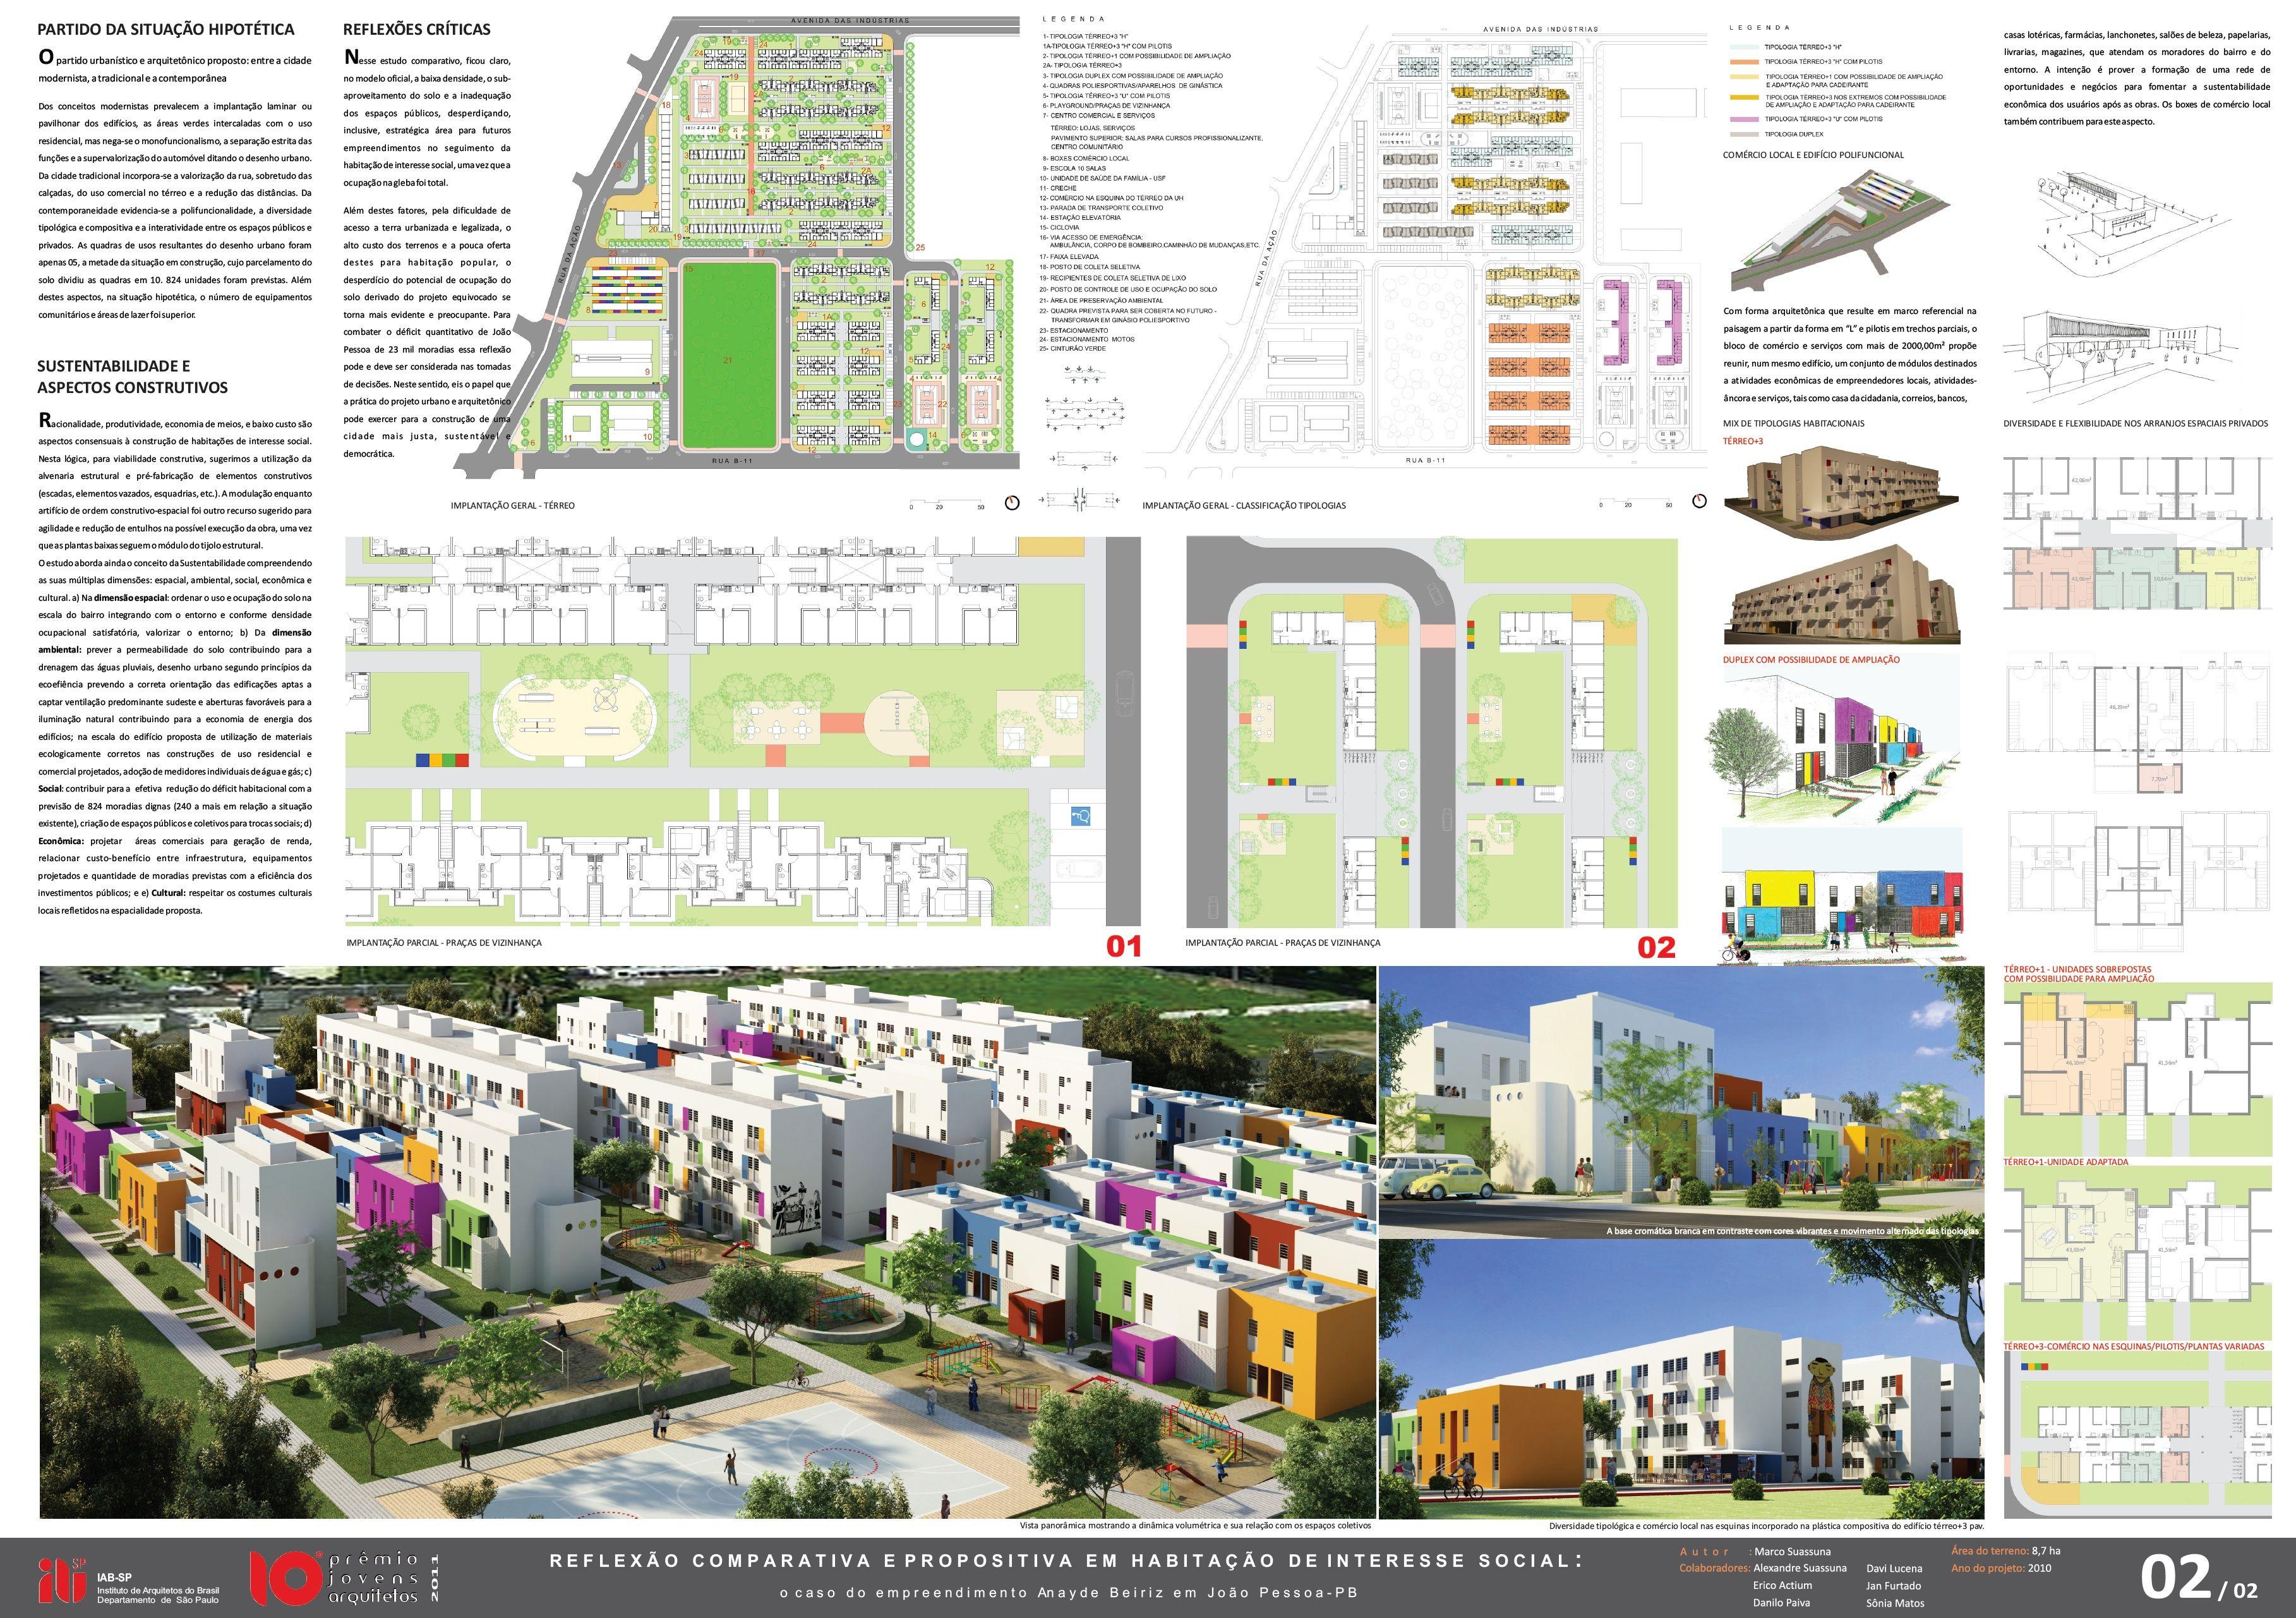 Muito conjunto habitacional | Architecture | Pinterest | Habitação  CS79